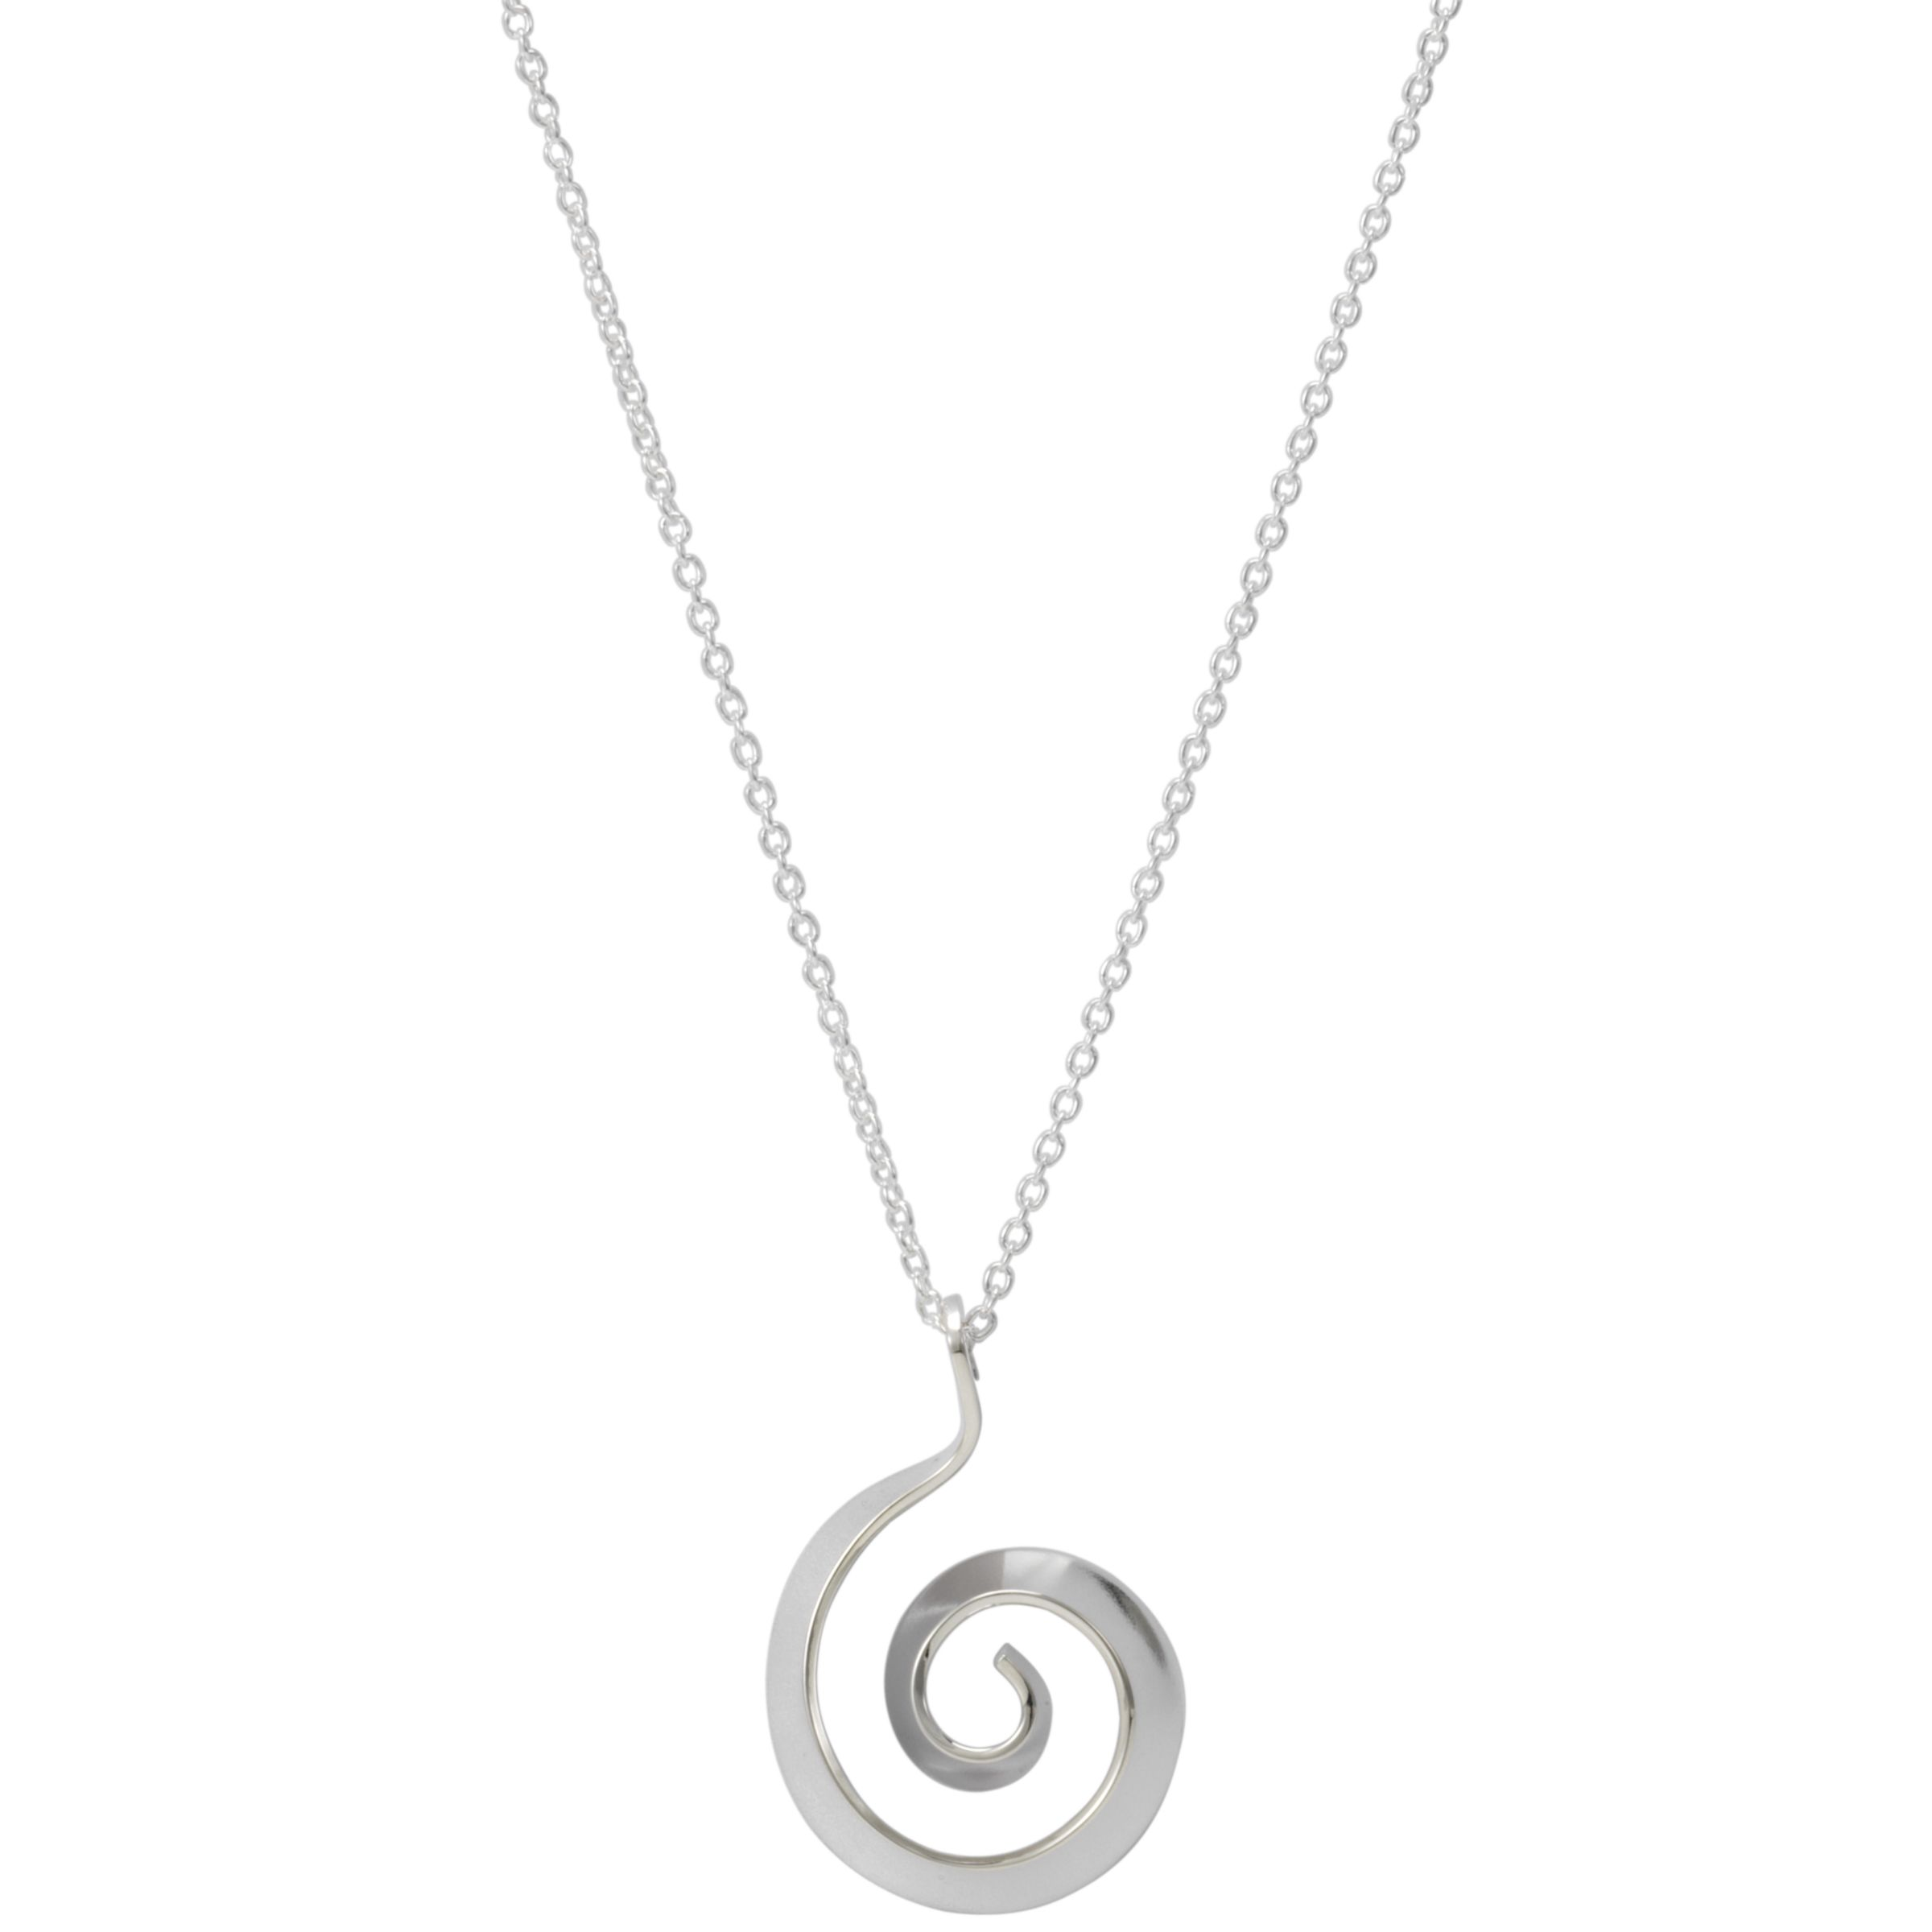 Andea Silver Swirl Pendant Necklace